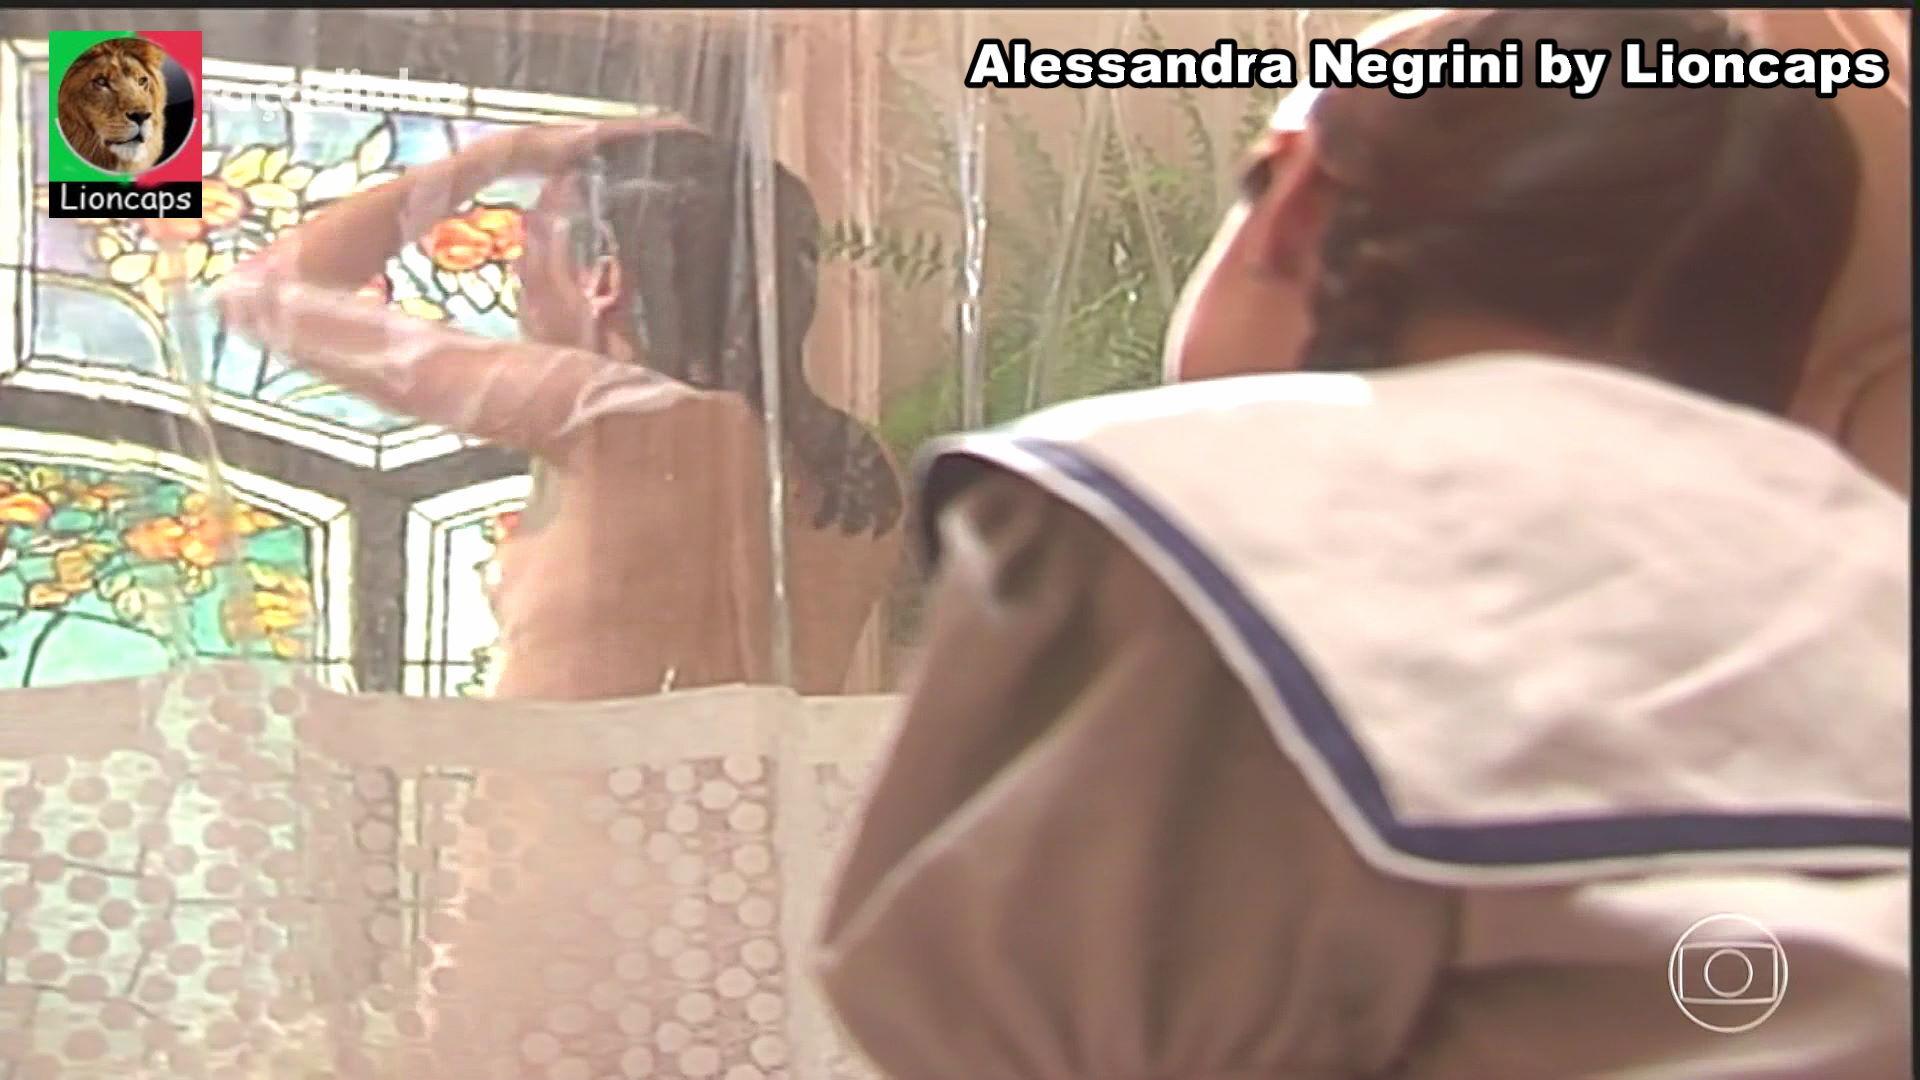 alessandra_negrini_vs200503-068 (3).JPG